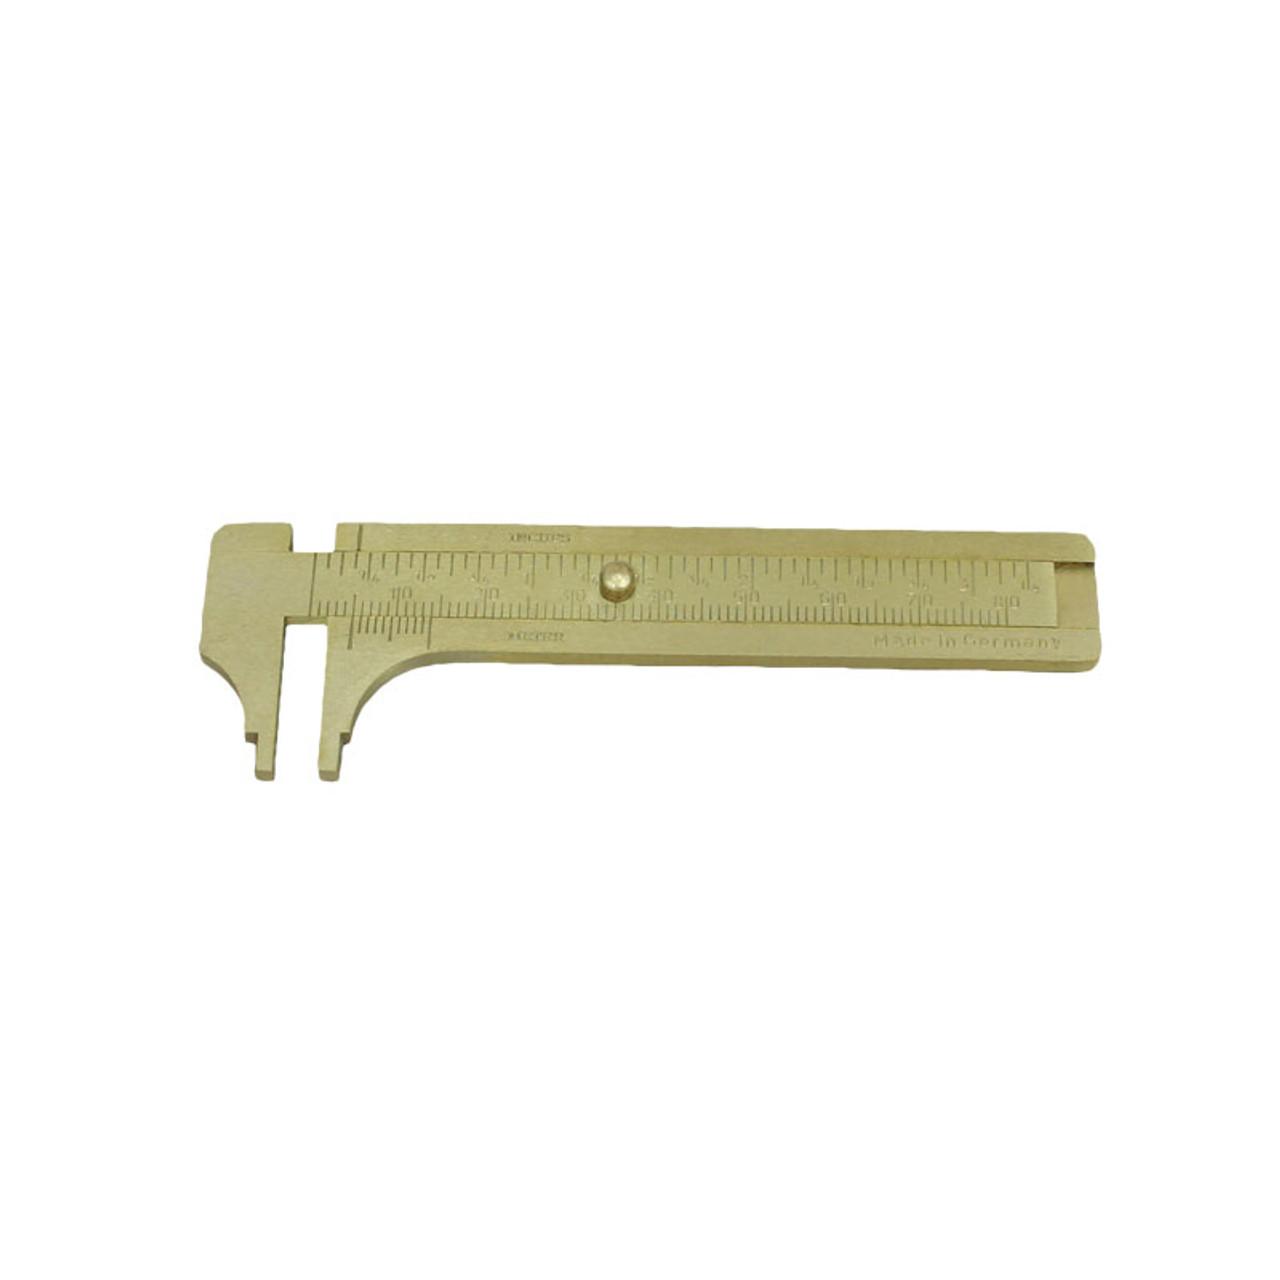 0-80mm 3-inch Brass Mini Sliding Gauge Pocket Vernier Caliper Measure Tool